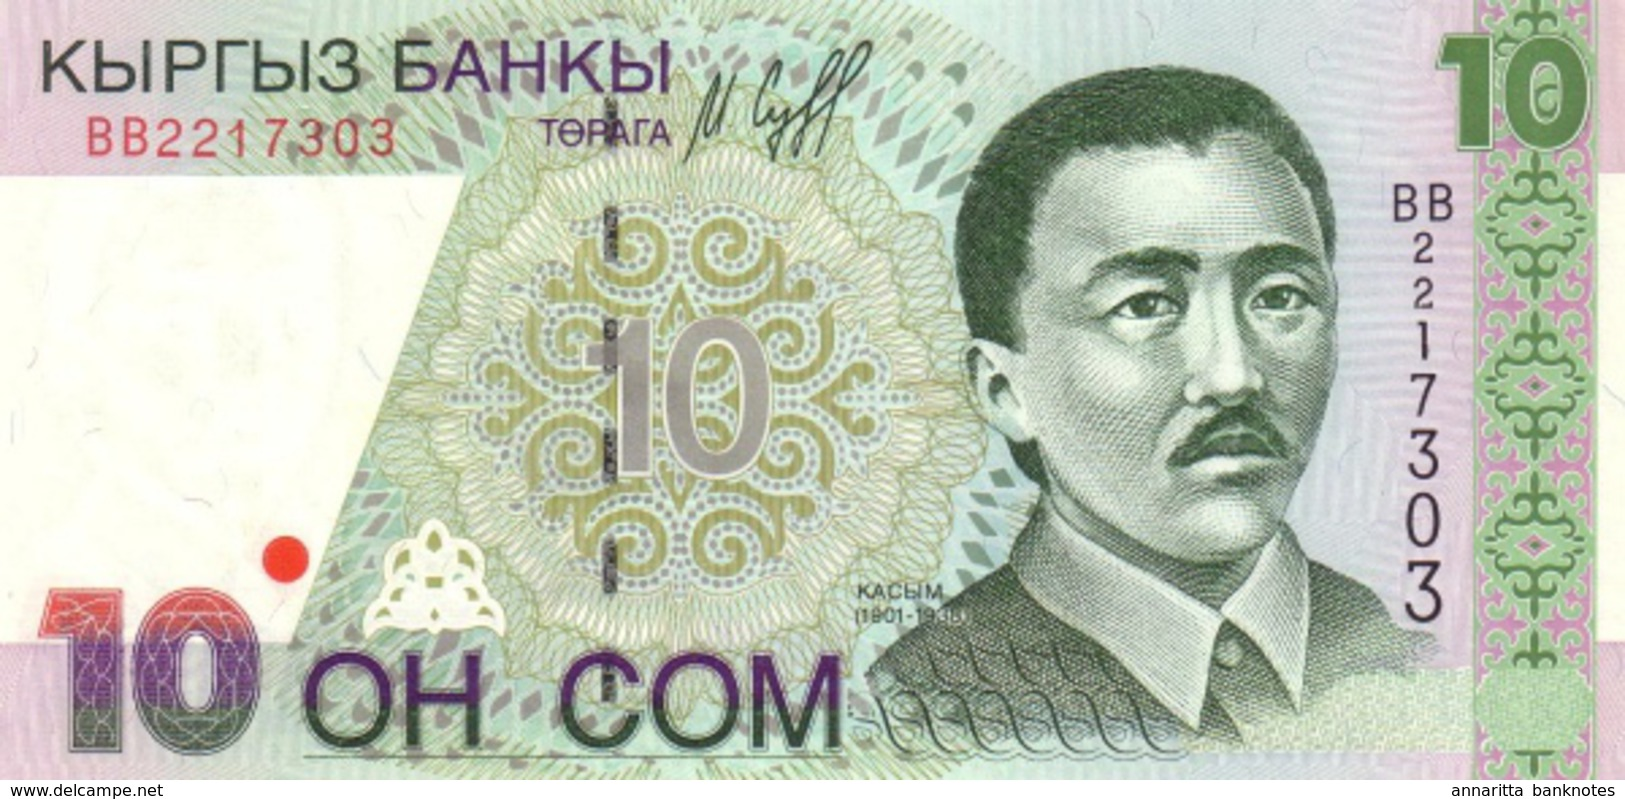 KYRGYZSTAN 10 COM (SOM) 1997 P-14 UNC [ KG212a ] - Kyrgyzstan